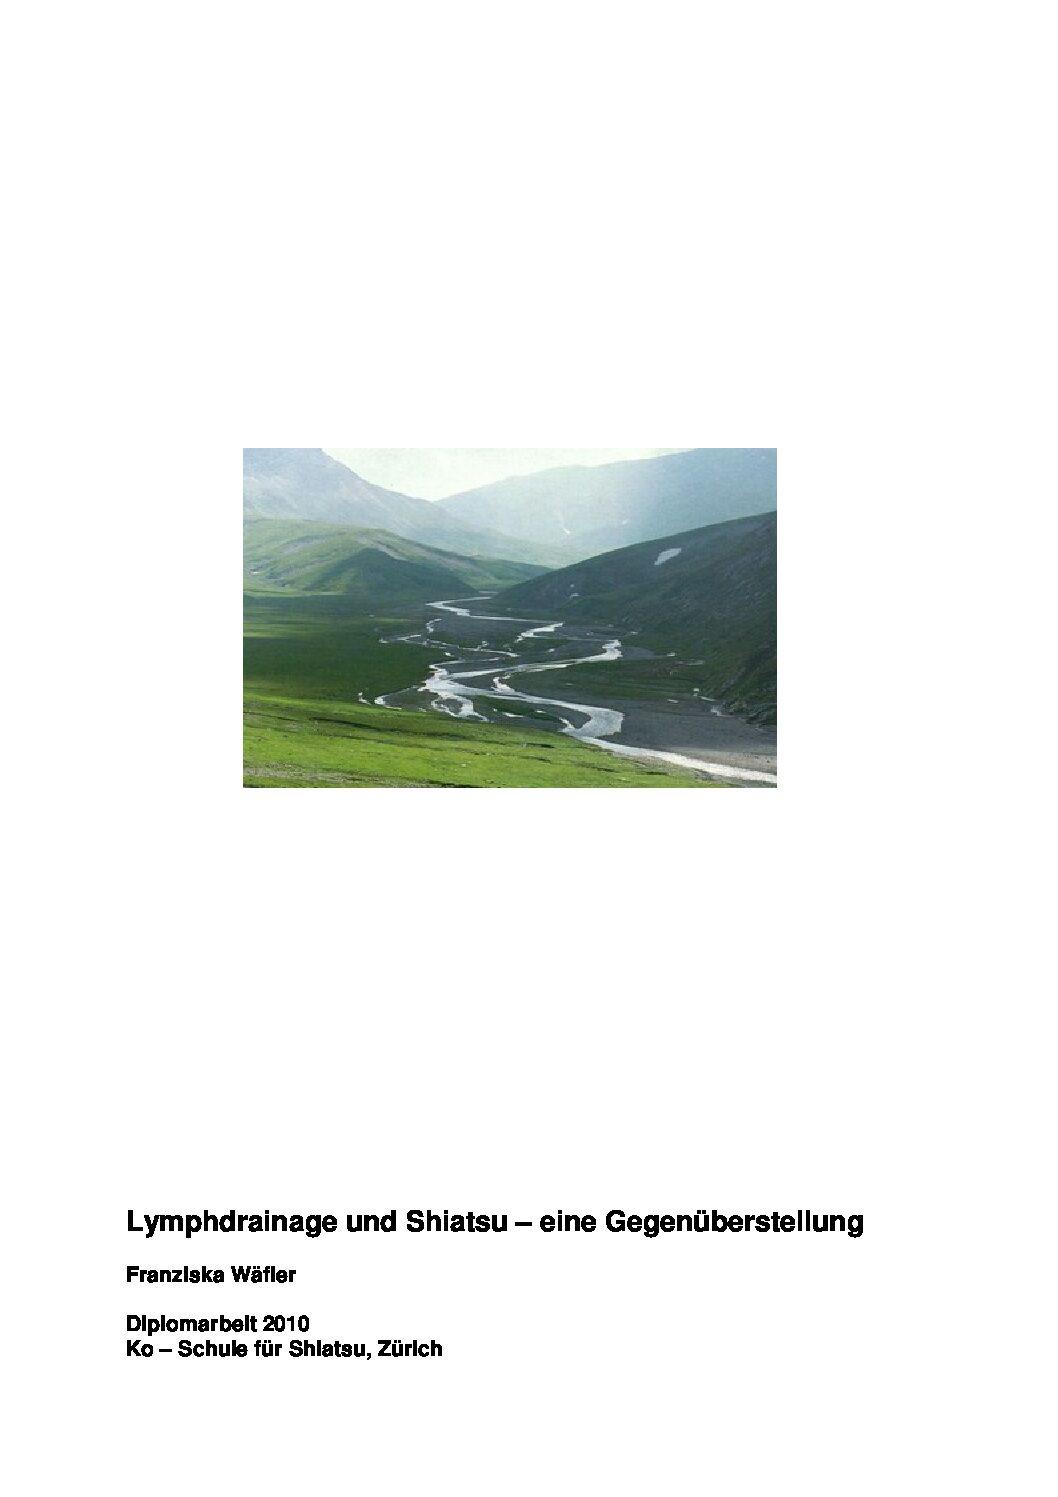 Lymphdrainage und Shiatsu (2010, Franziska Wäfler)